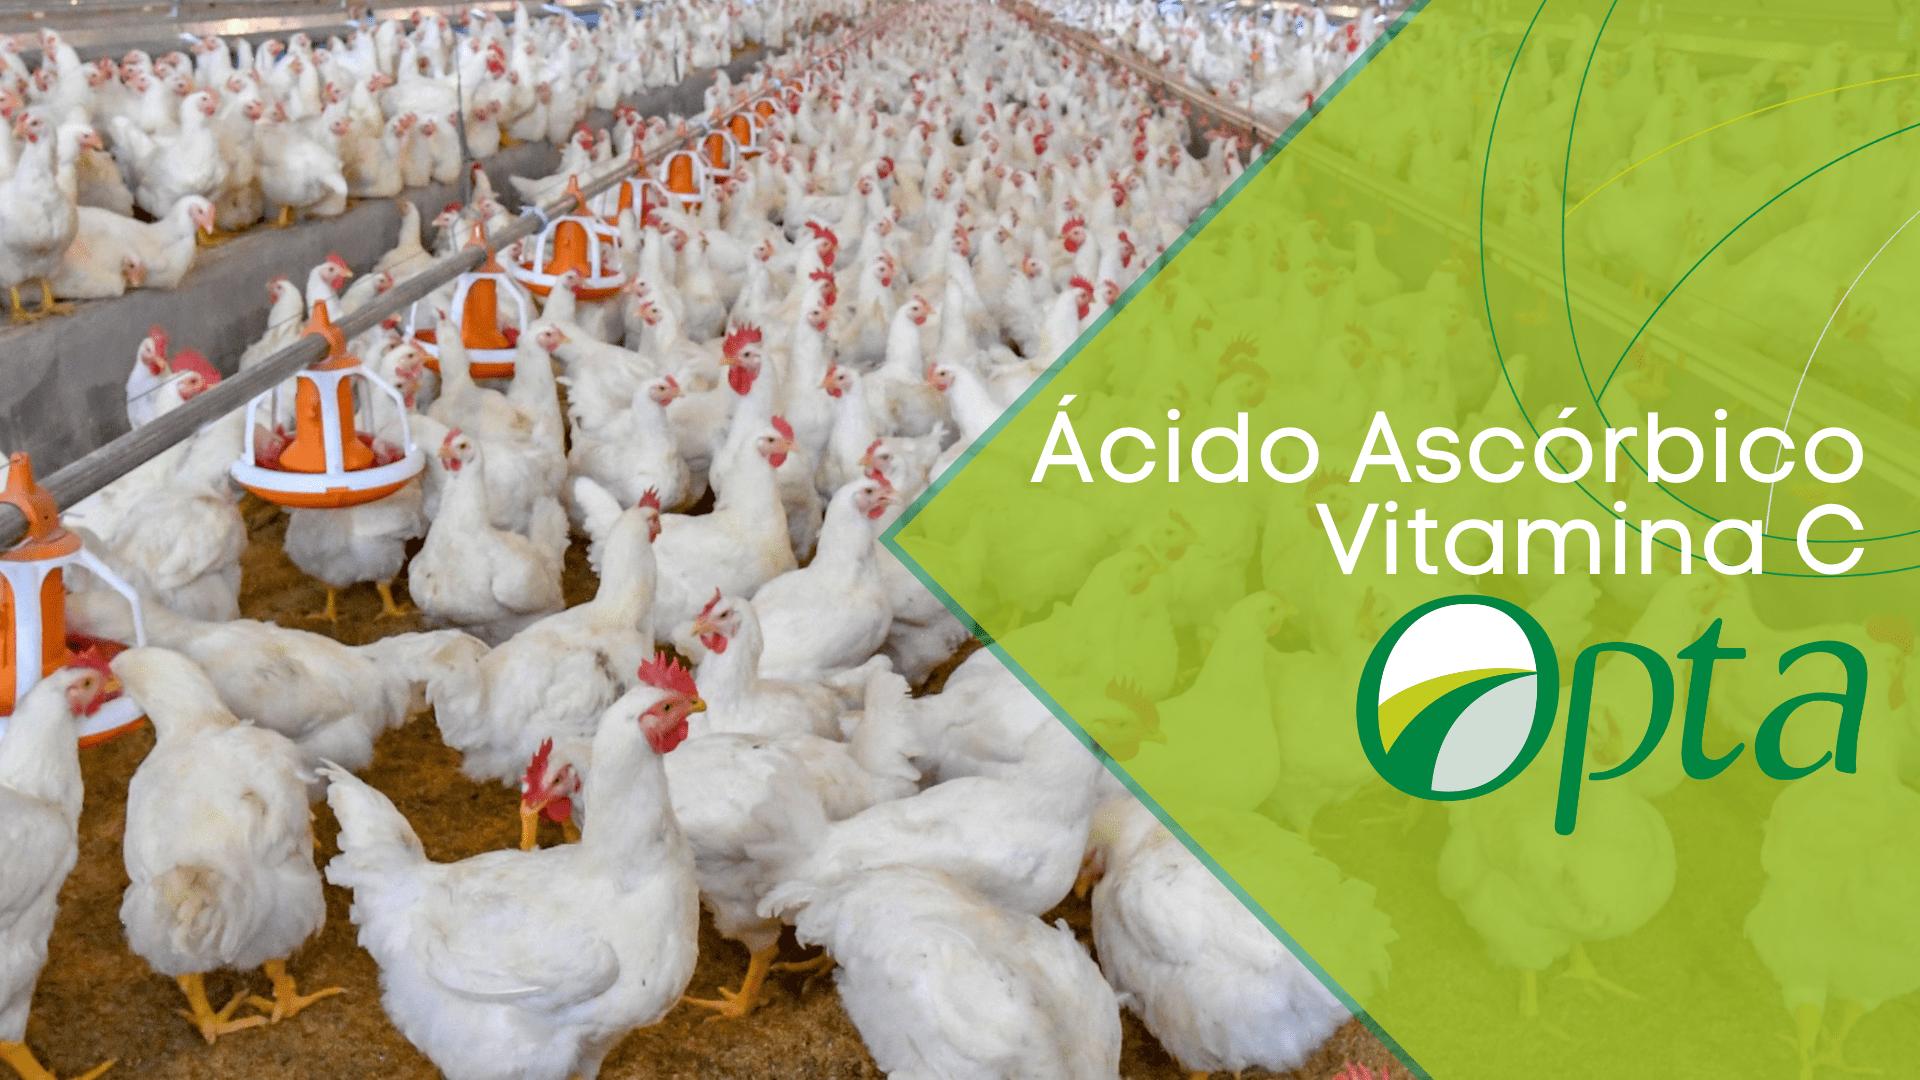 Ascorbic acid (Vitamin C) – Broiler nutrition